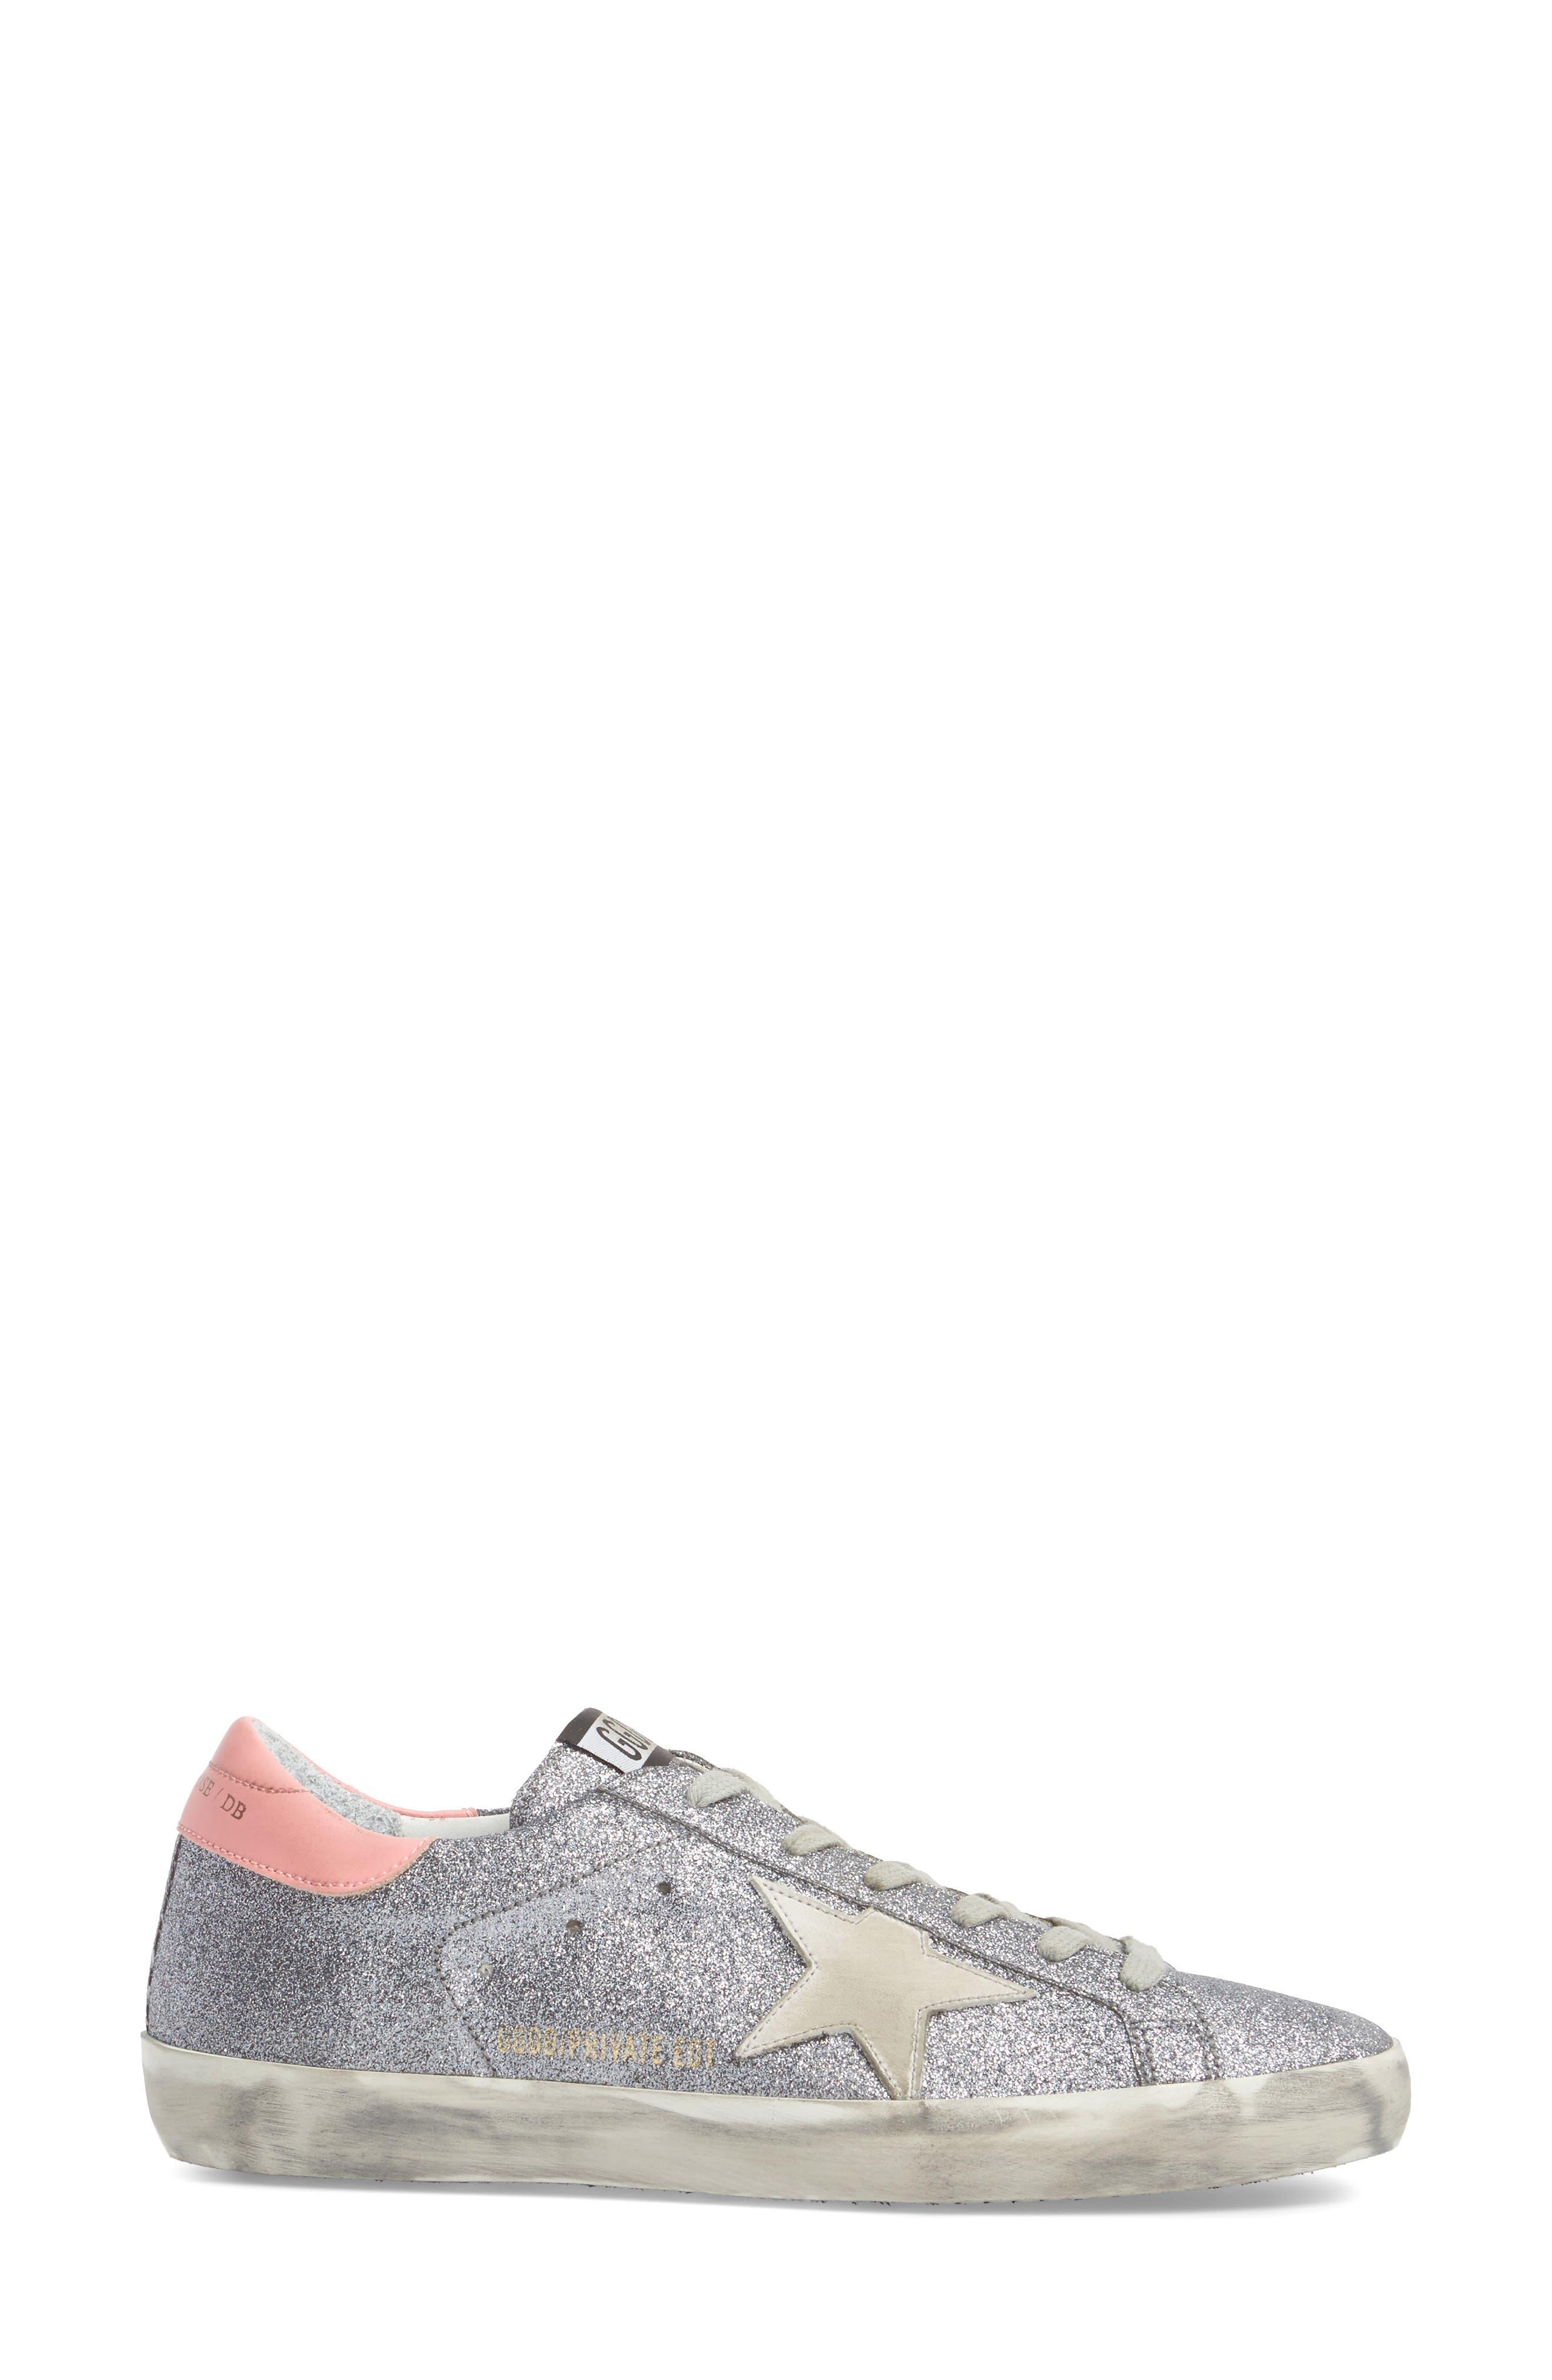 Superstar Low Top Sneaker,                             Alternate thumbnail 3, color,                             Gunmetal/ White